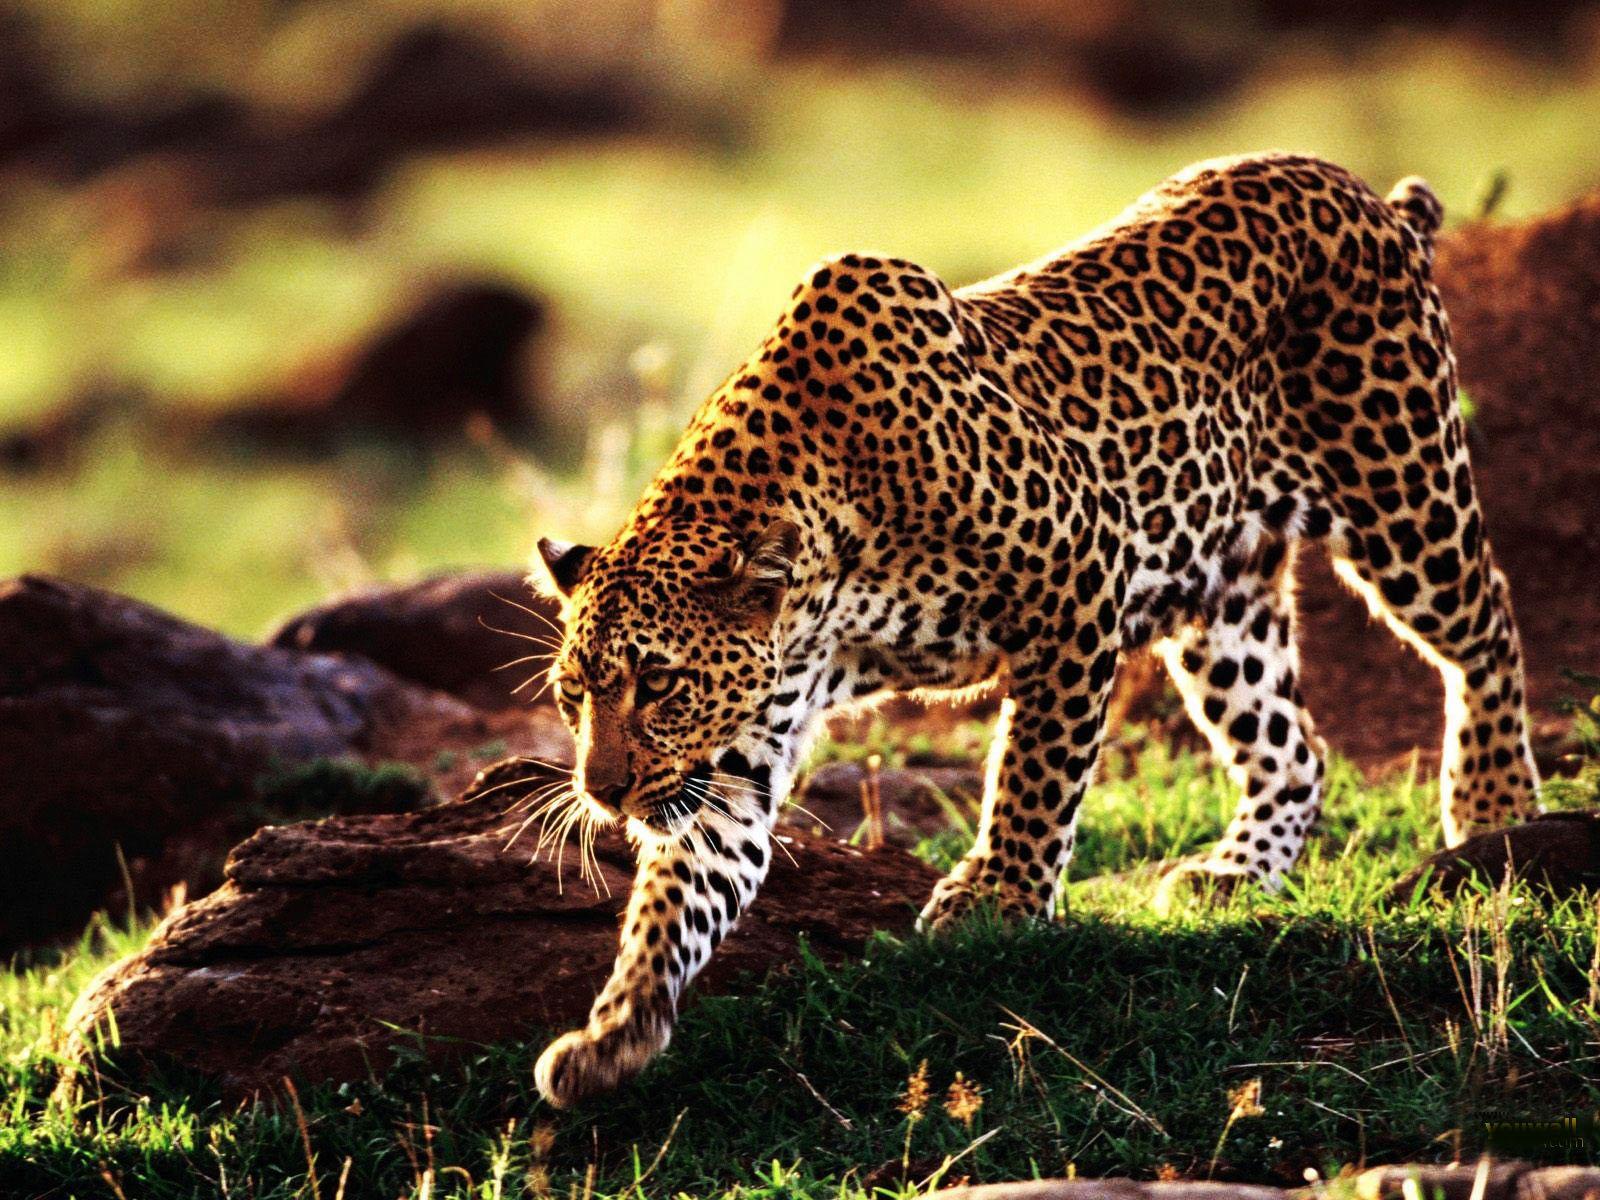 Beautiful Cheetah Latest Hd Wallpapers/Images 2013 | Beautiful And Dangerous Animals/Birds Hd ...